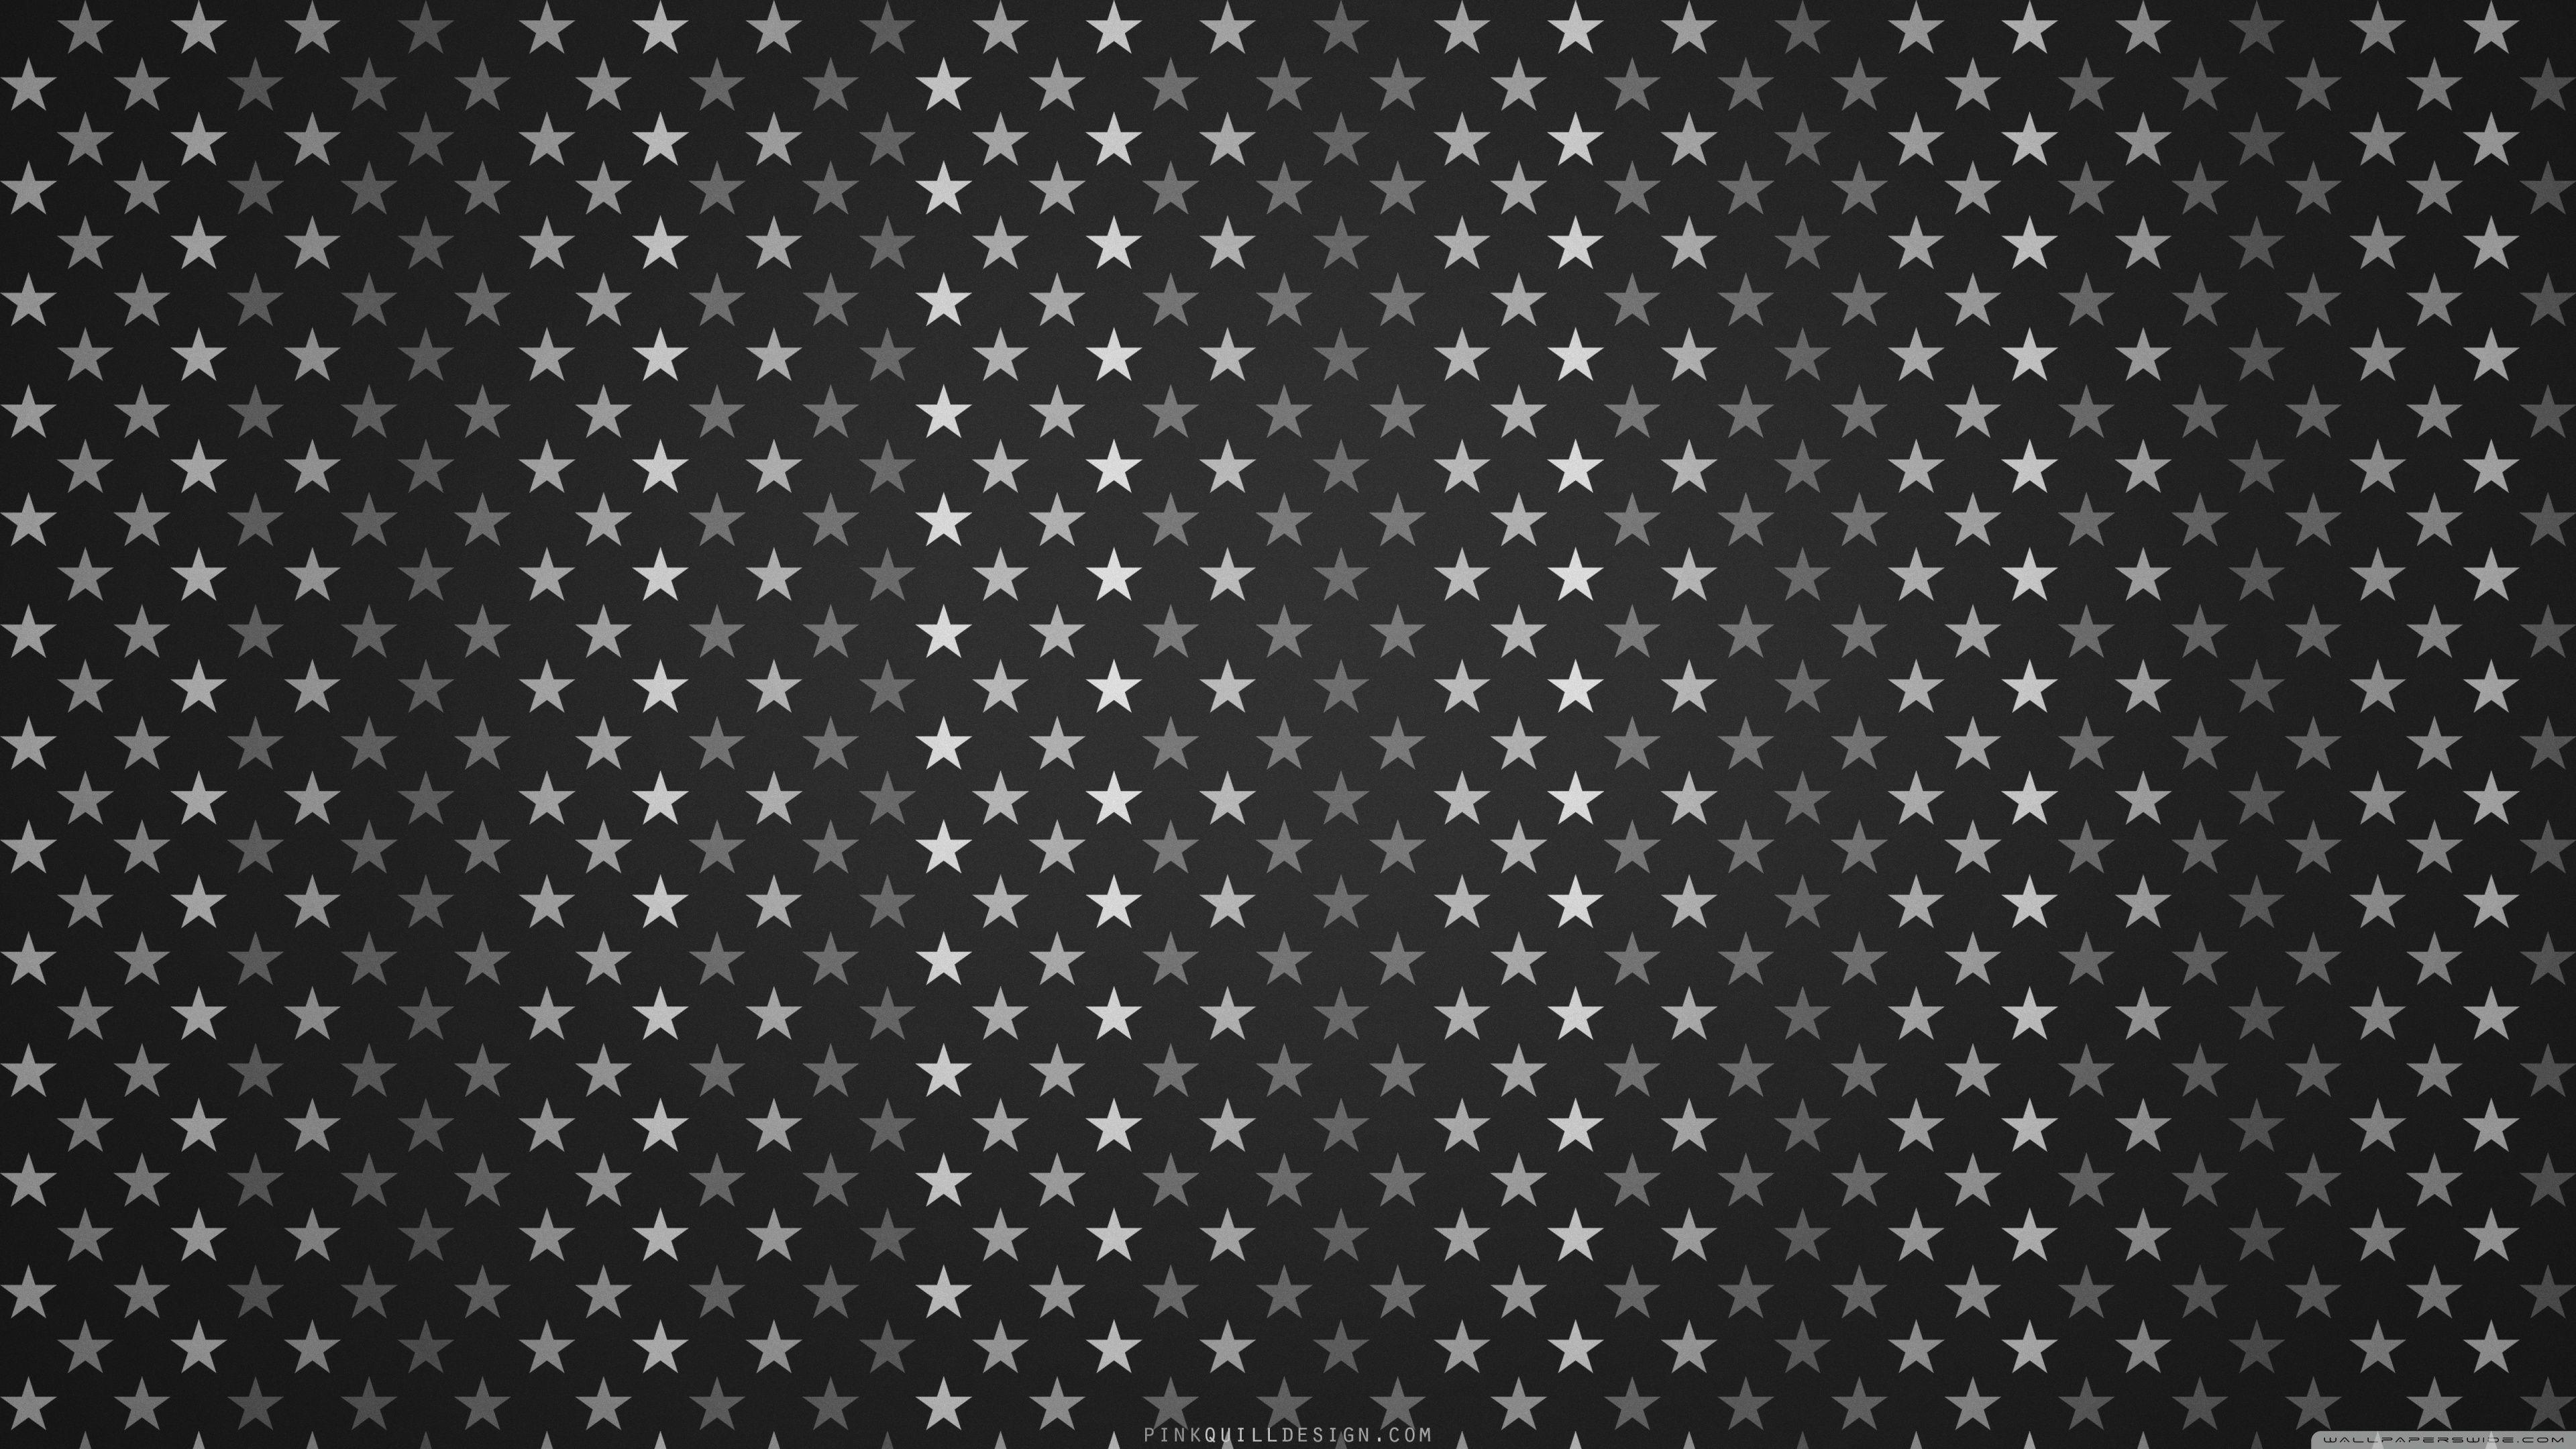 4k Pattern Wallpapers Top Free 4k Pattern Backgrounds